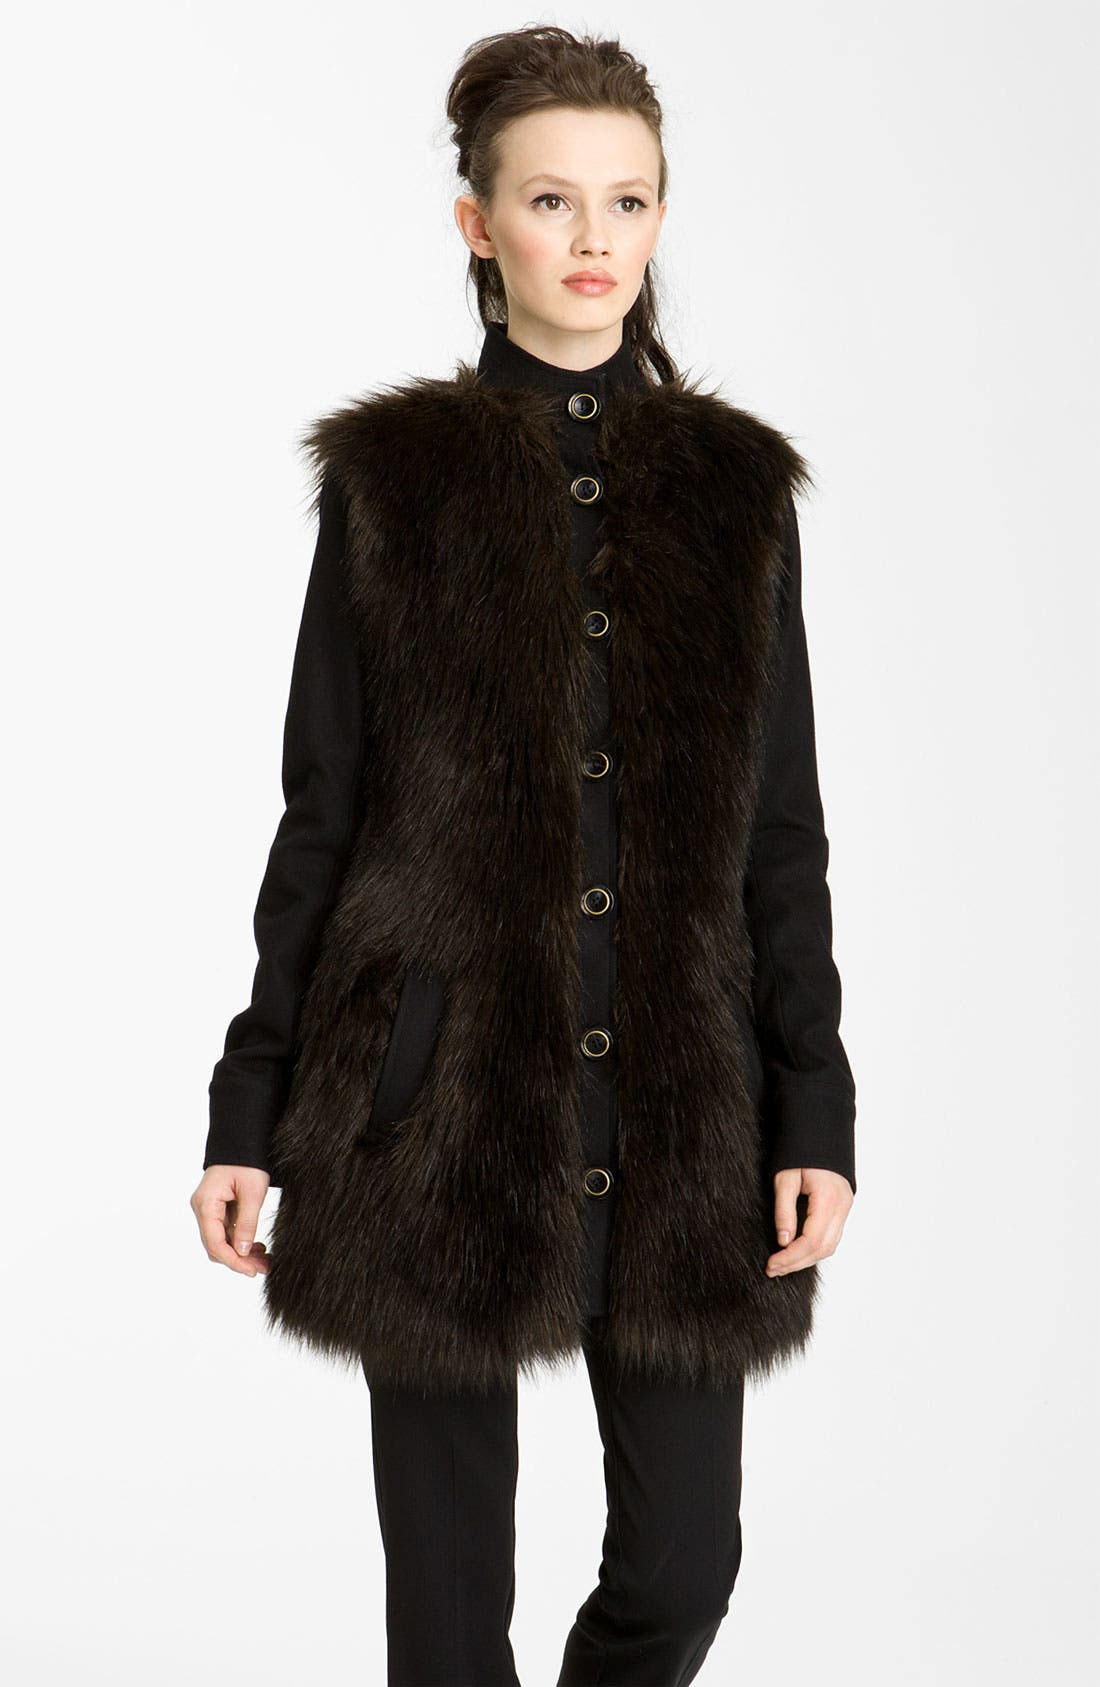 Alternate Image 1 Selected - Rachel Zoe 'Marianna' Faux Fur Jacket